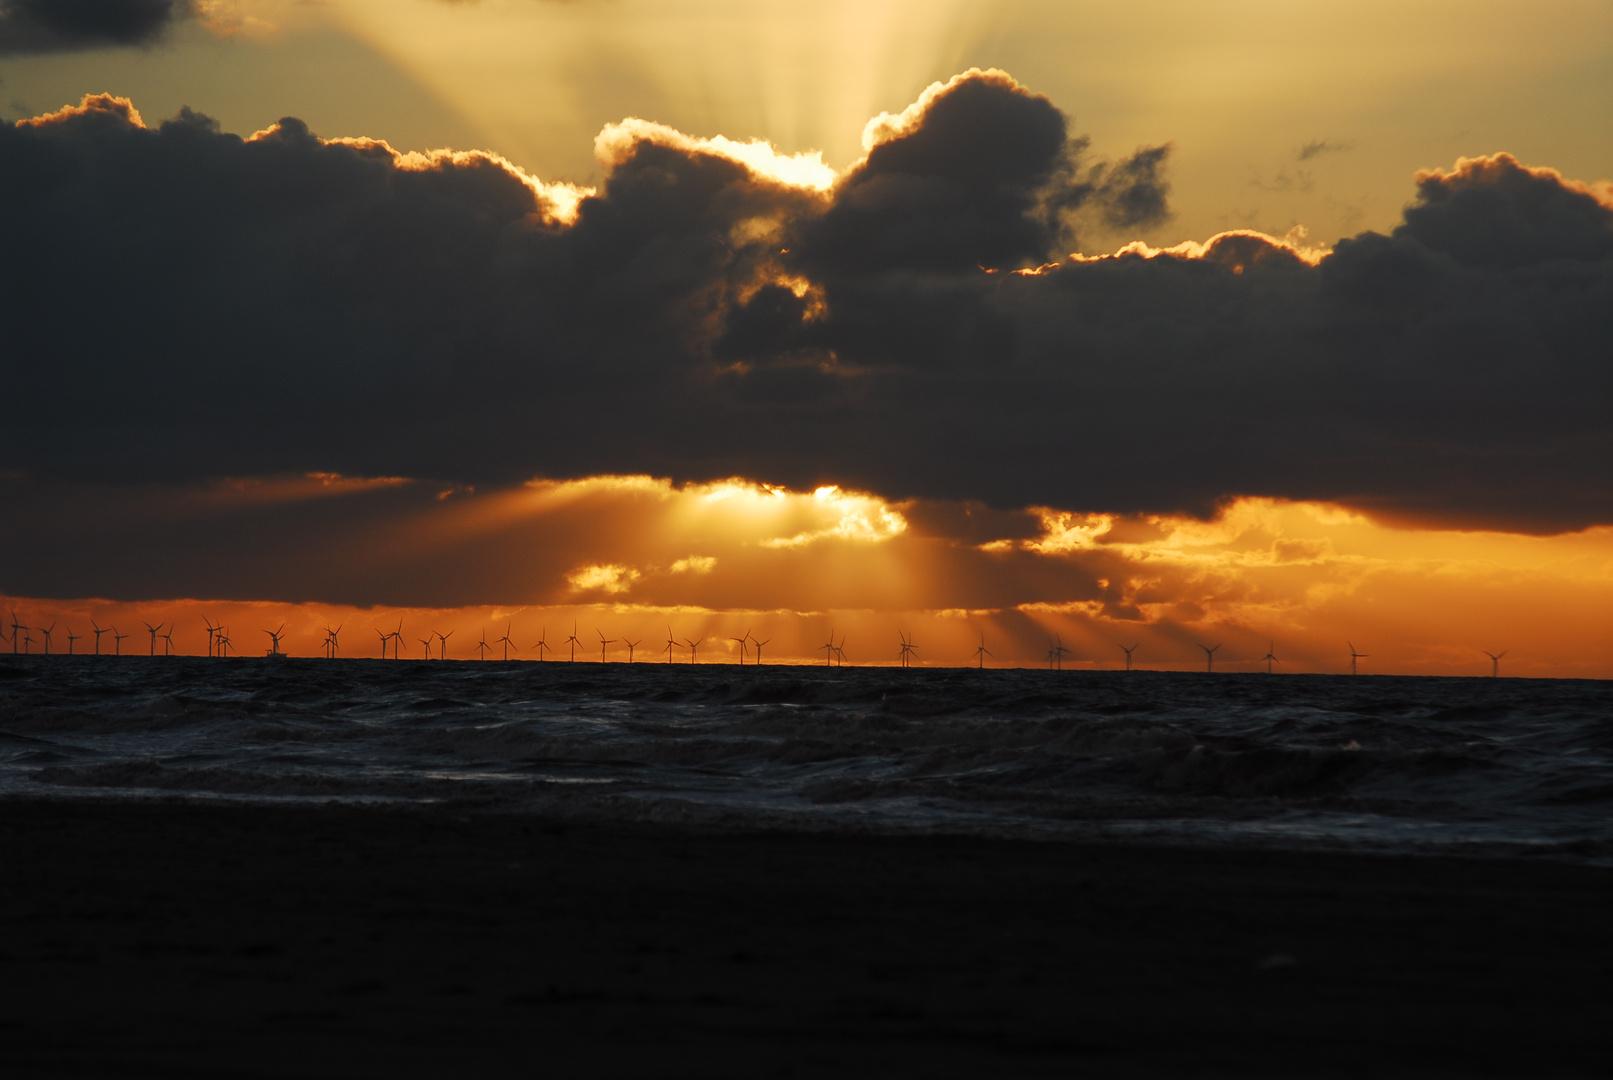 Windkraft Dänemarks